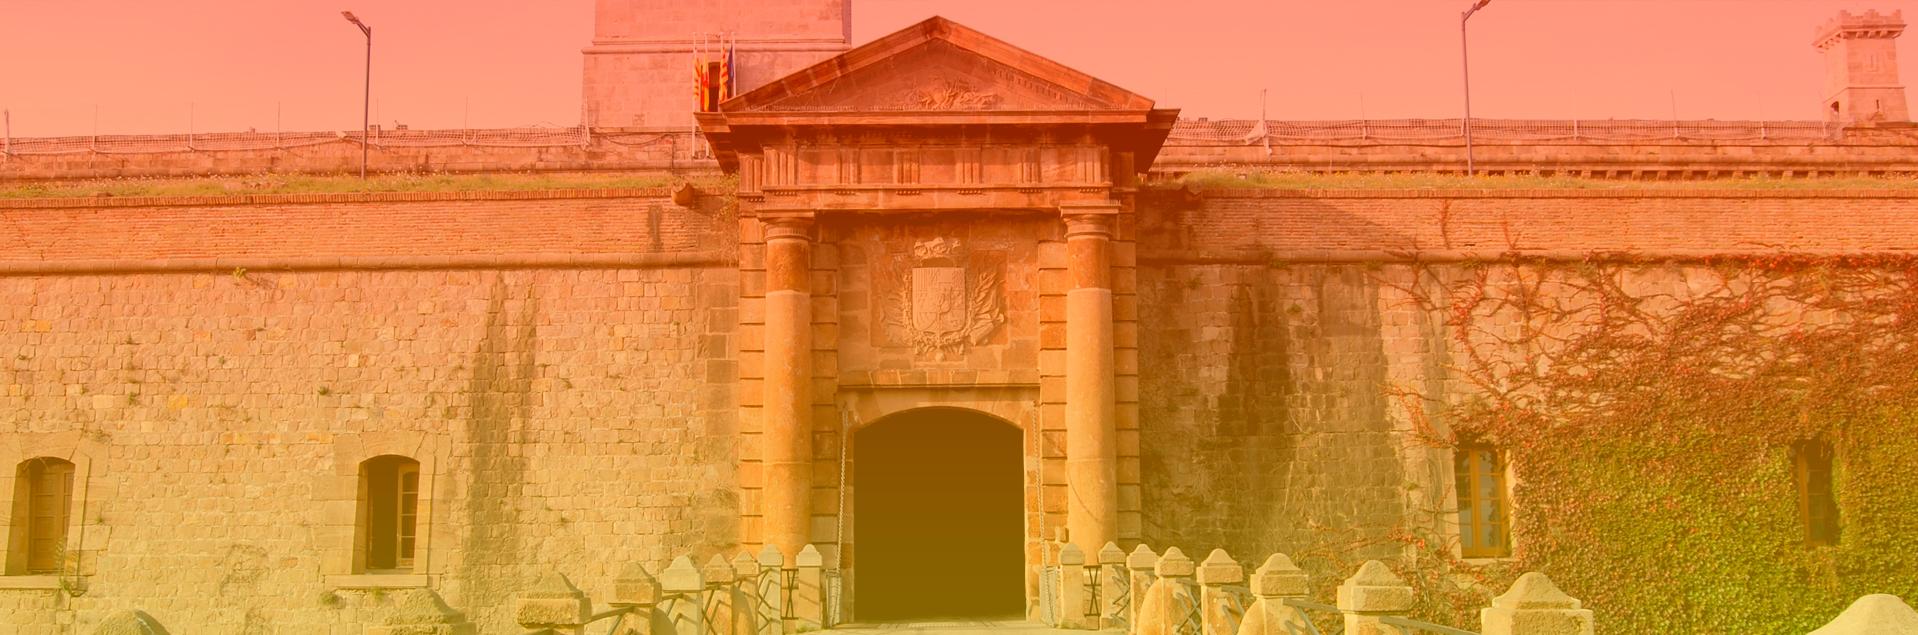 Fachada del Castillo de Montjuic